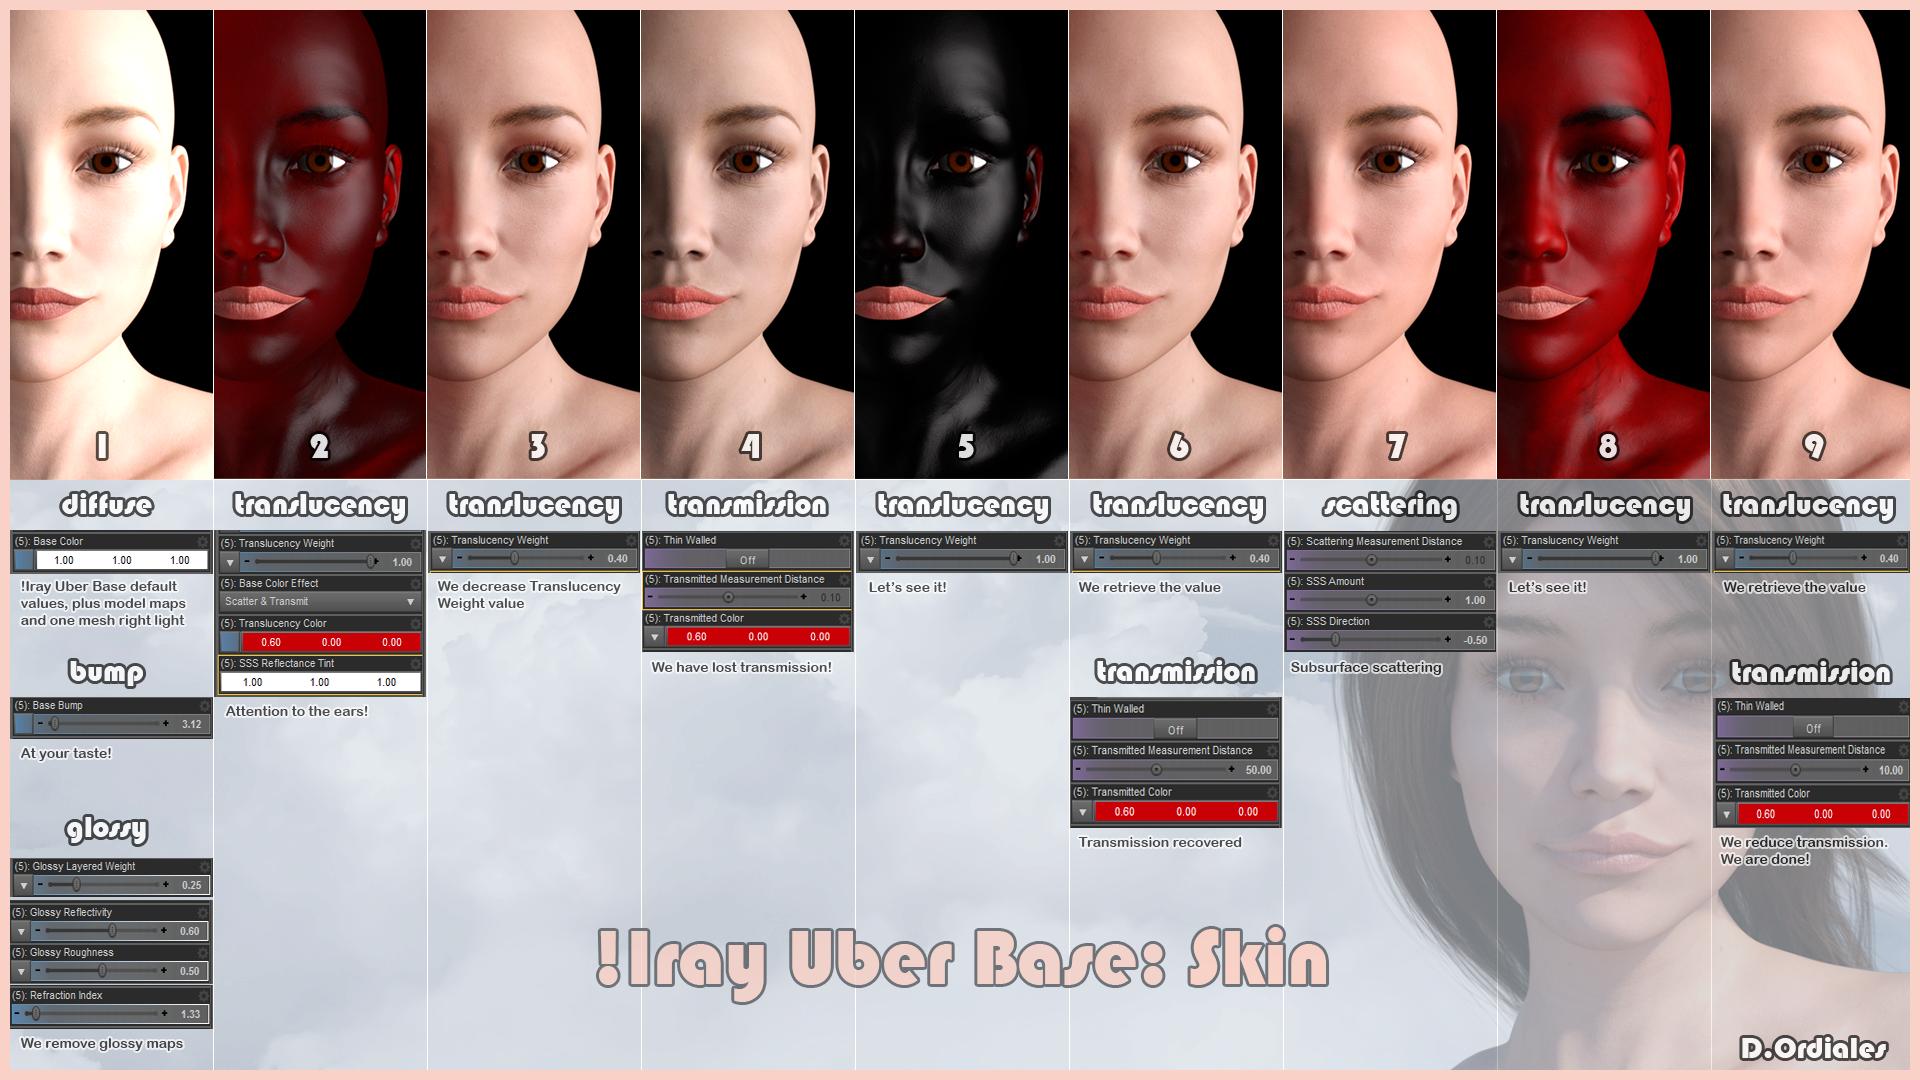 !Iray Uber Base: Skin